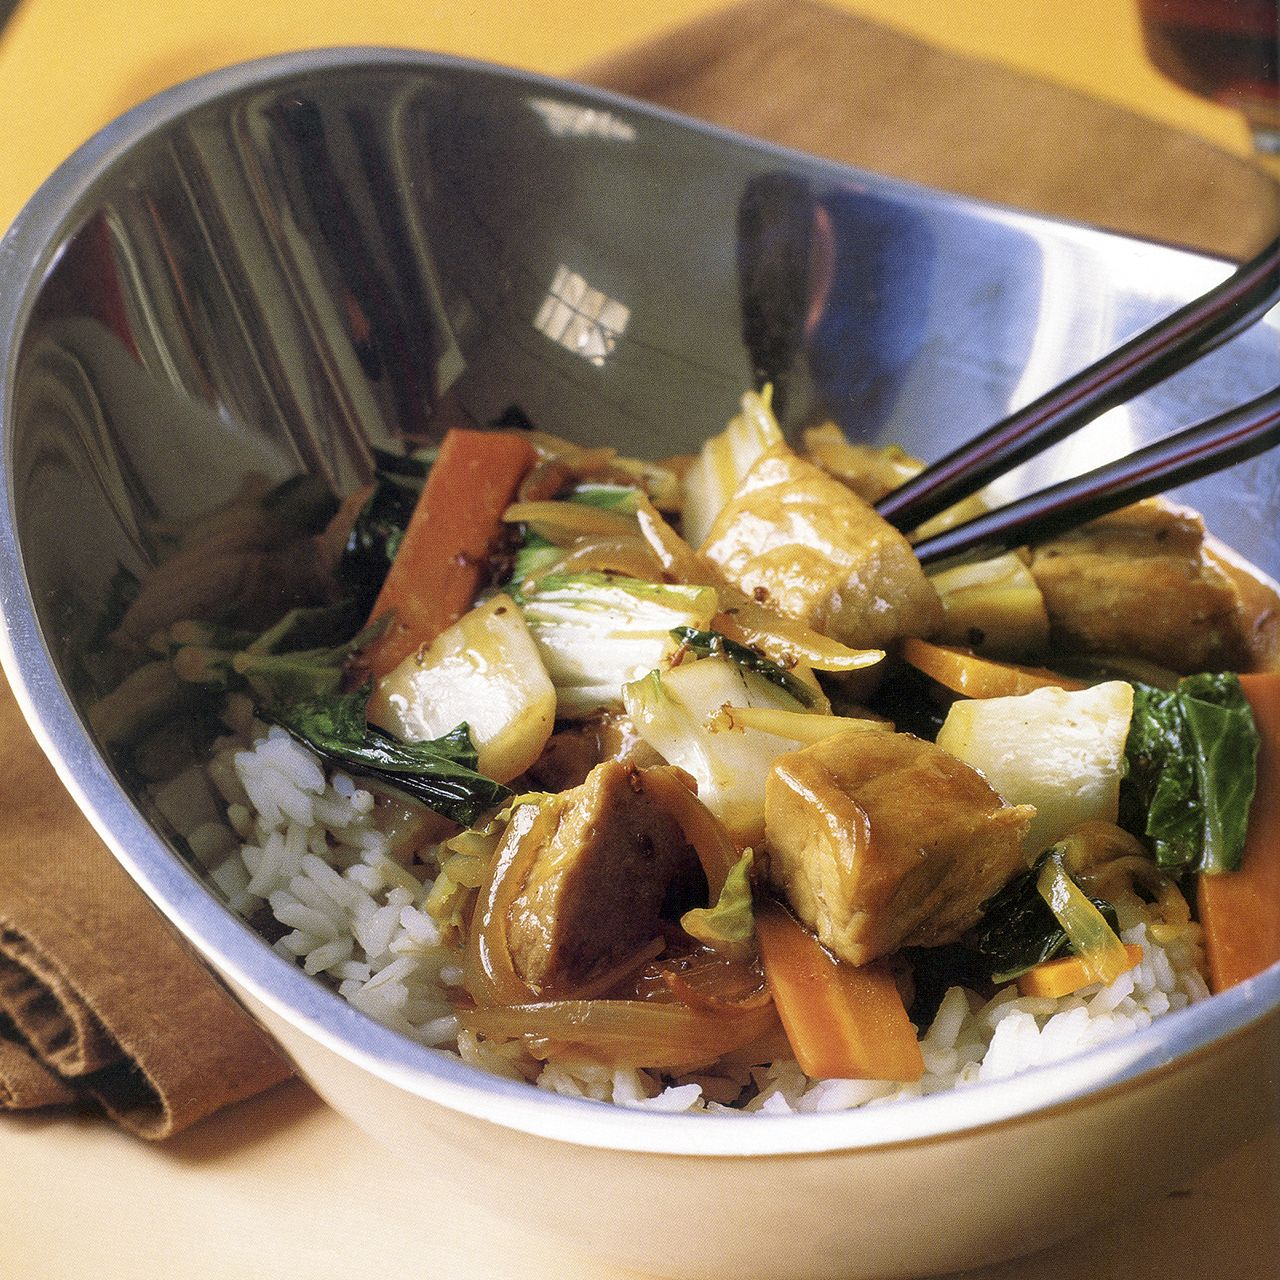 Stir-Fried Pork with Carrots and Bok Choy